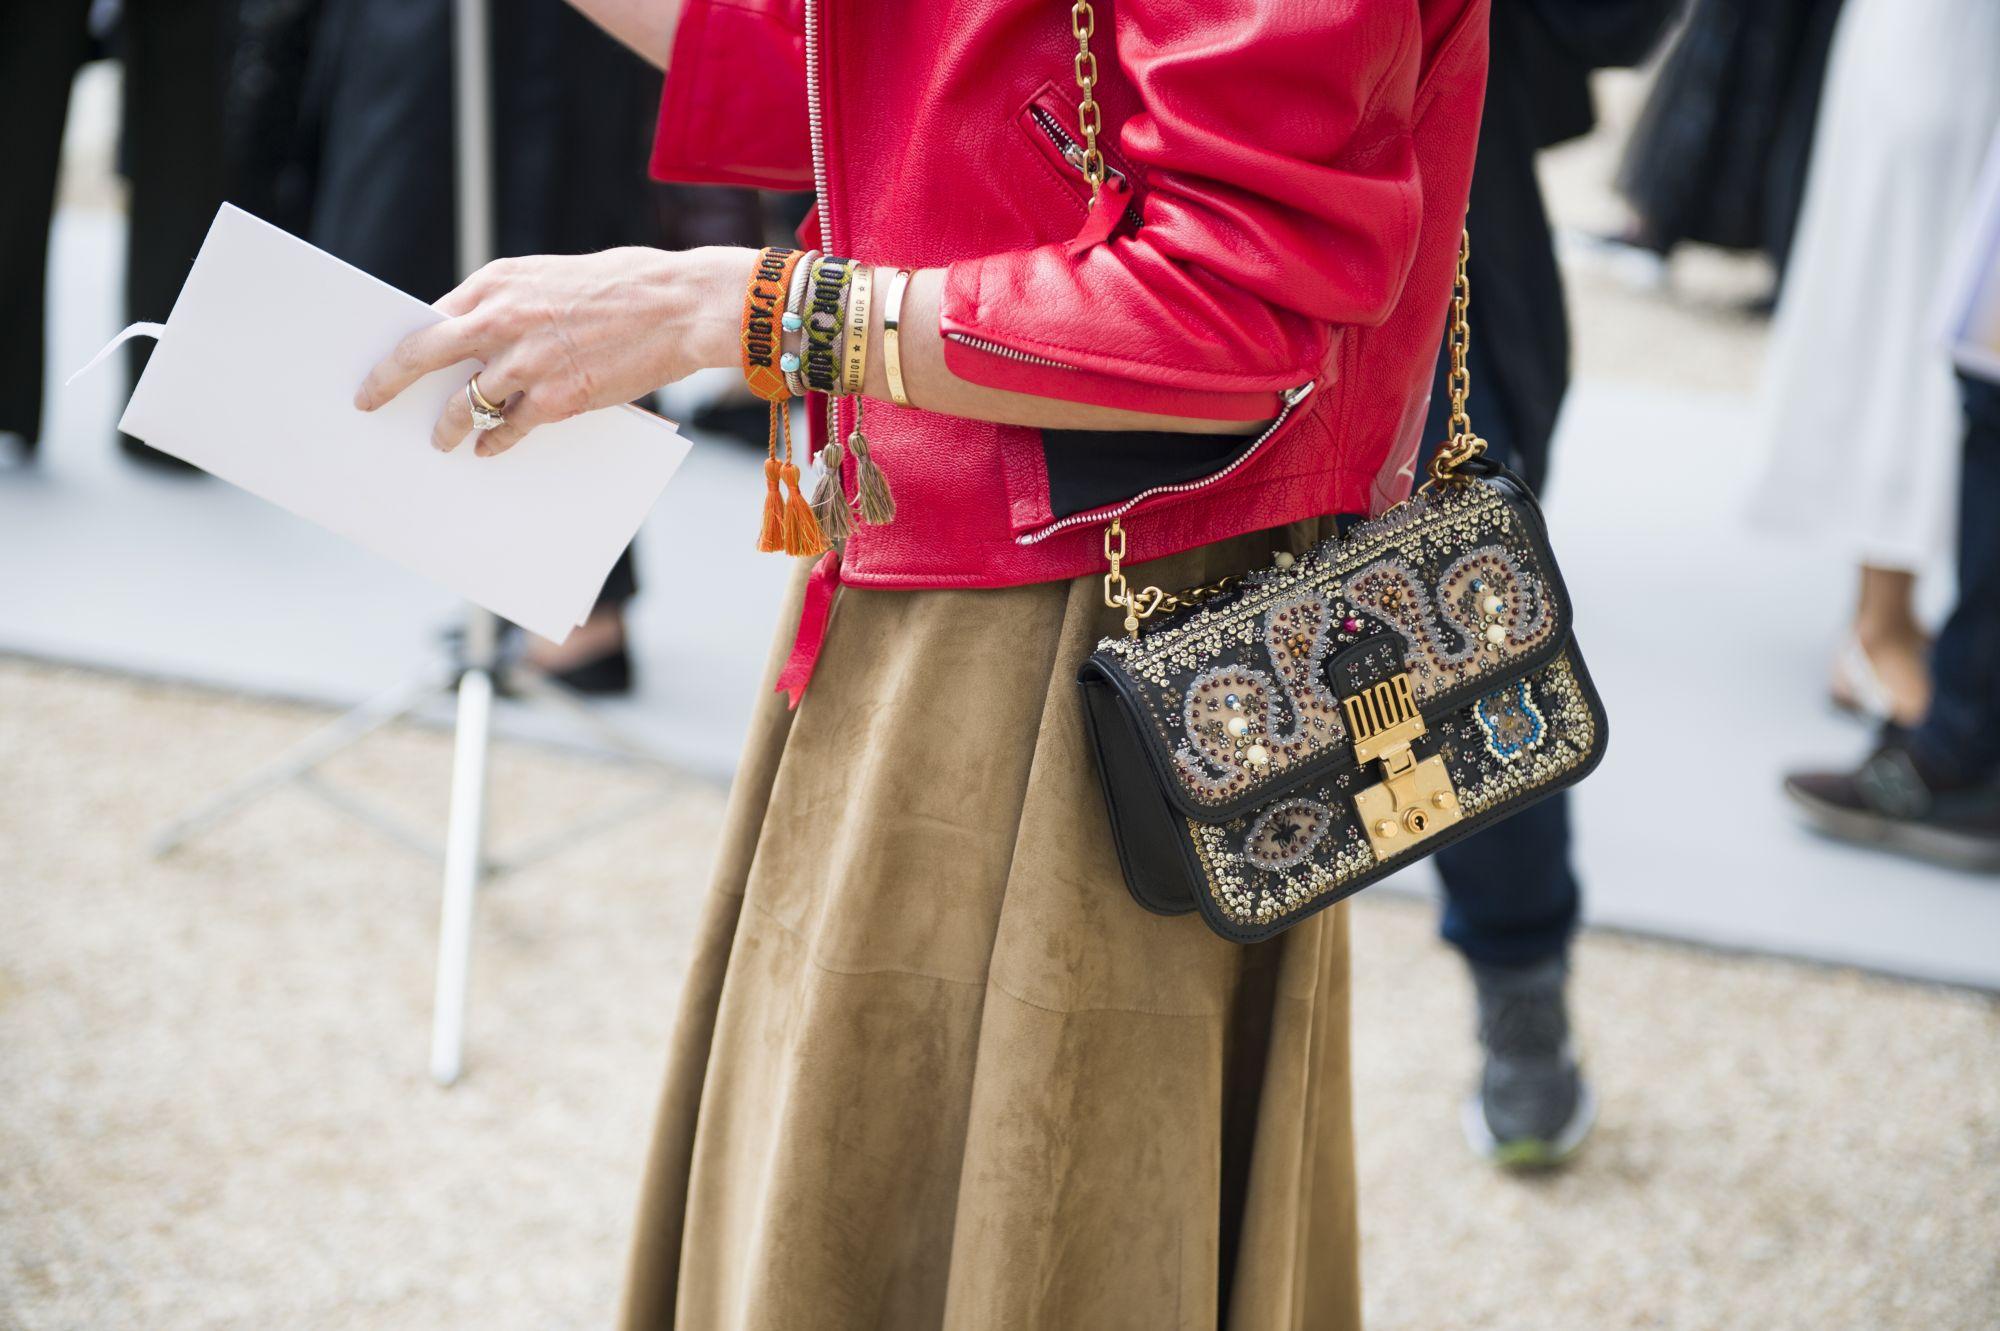 Insect Detail New Studded Velvet Women's Fashion Shoulder Bag